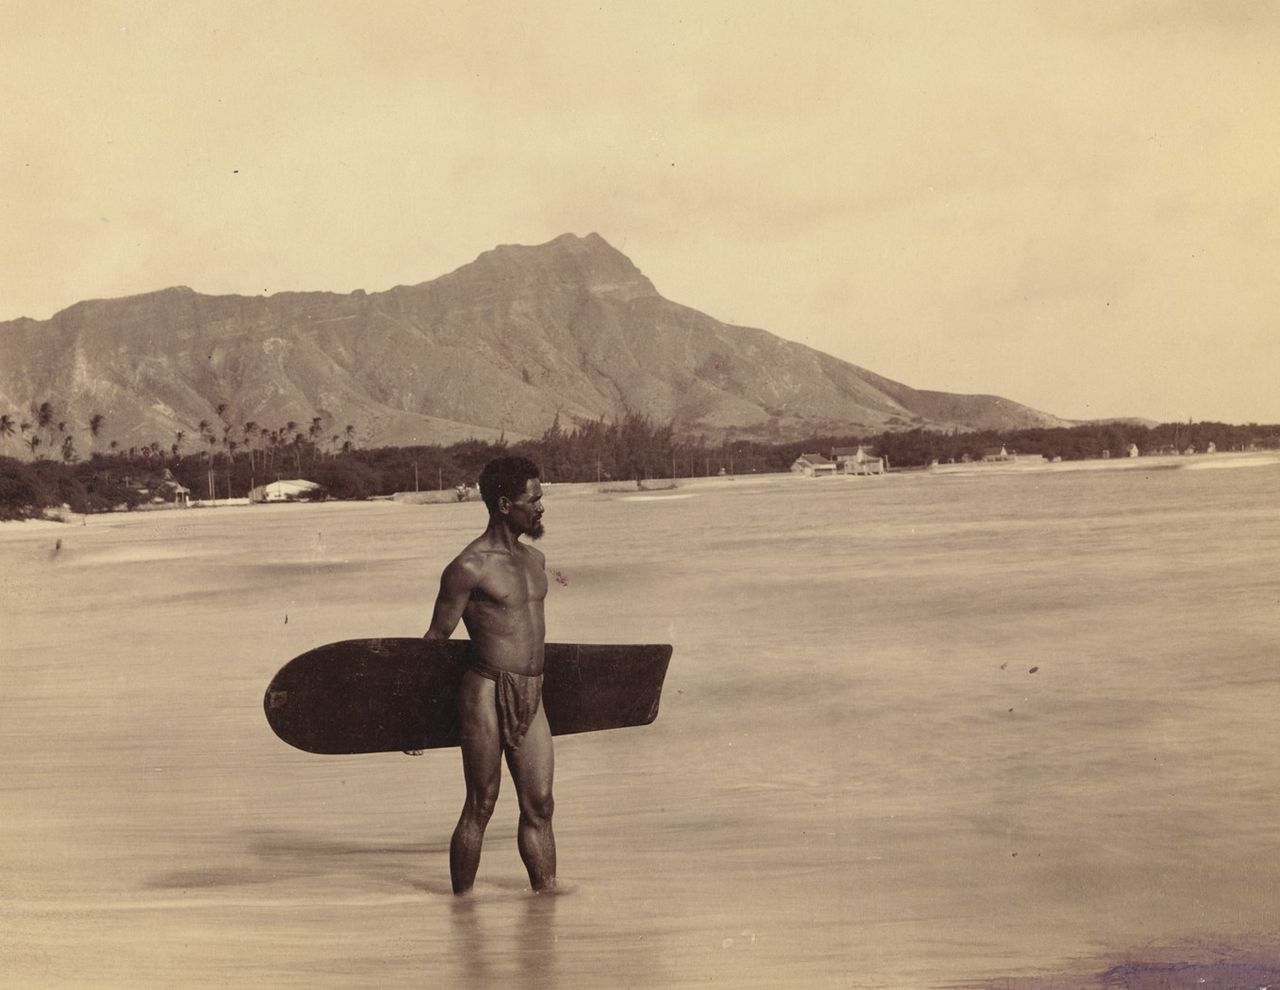 A Hawai'ian surfer